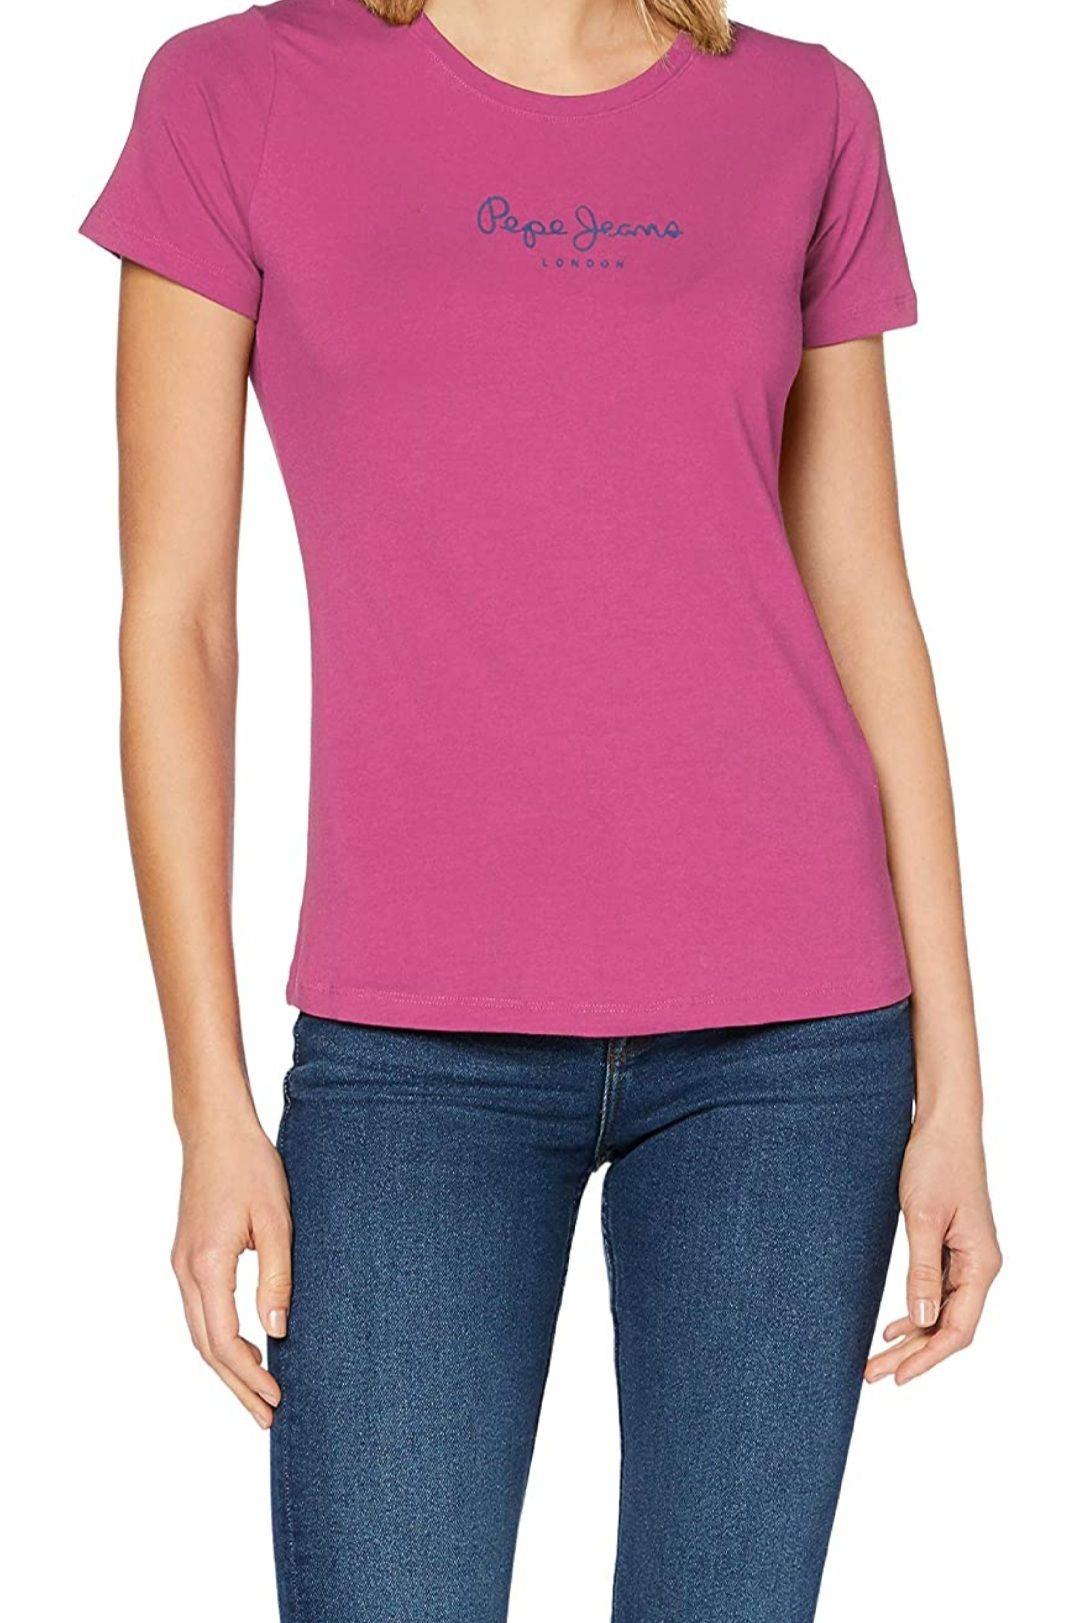 Camiseta Pepe Jeans mujer (Talla XS)